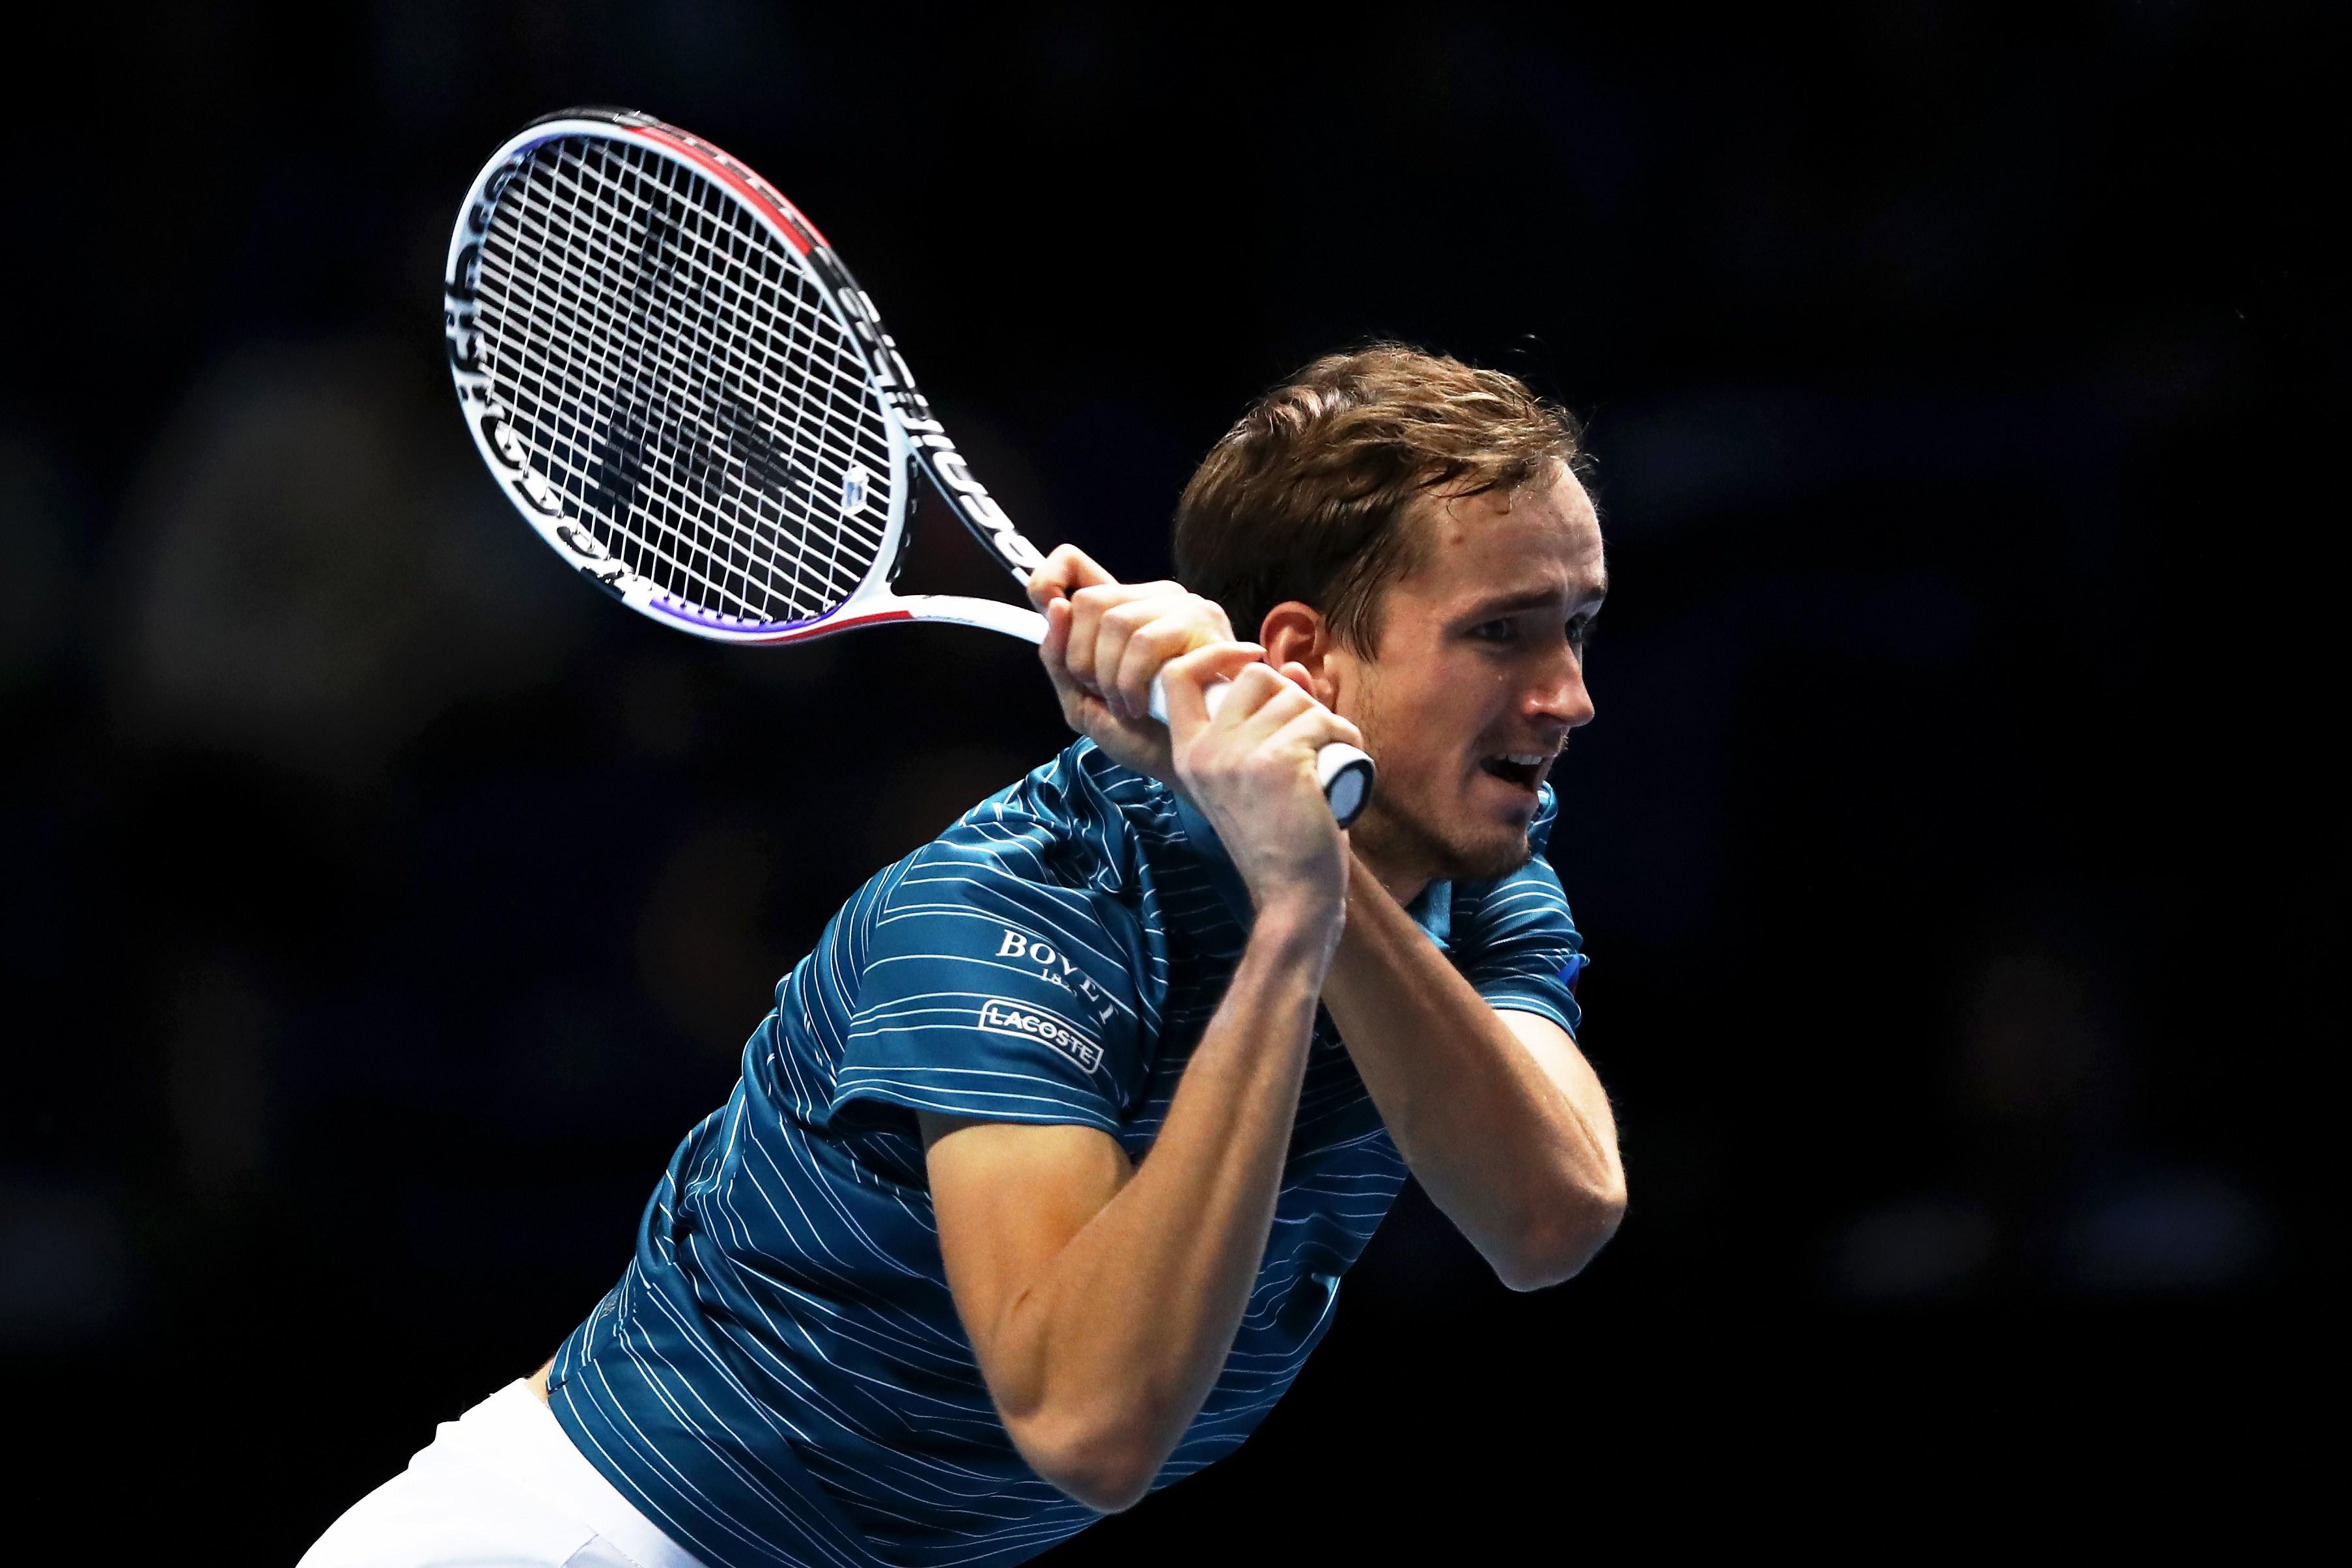 Daniil Medvedev au Masters 2019 à Londres